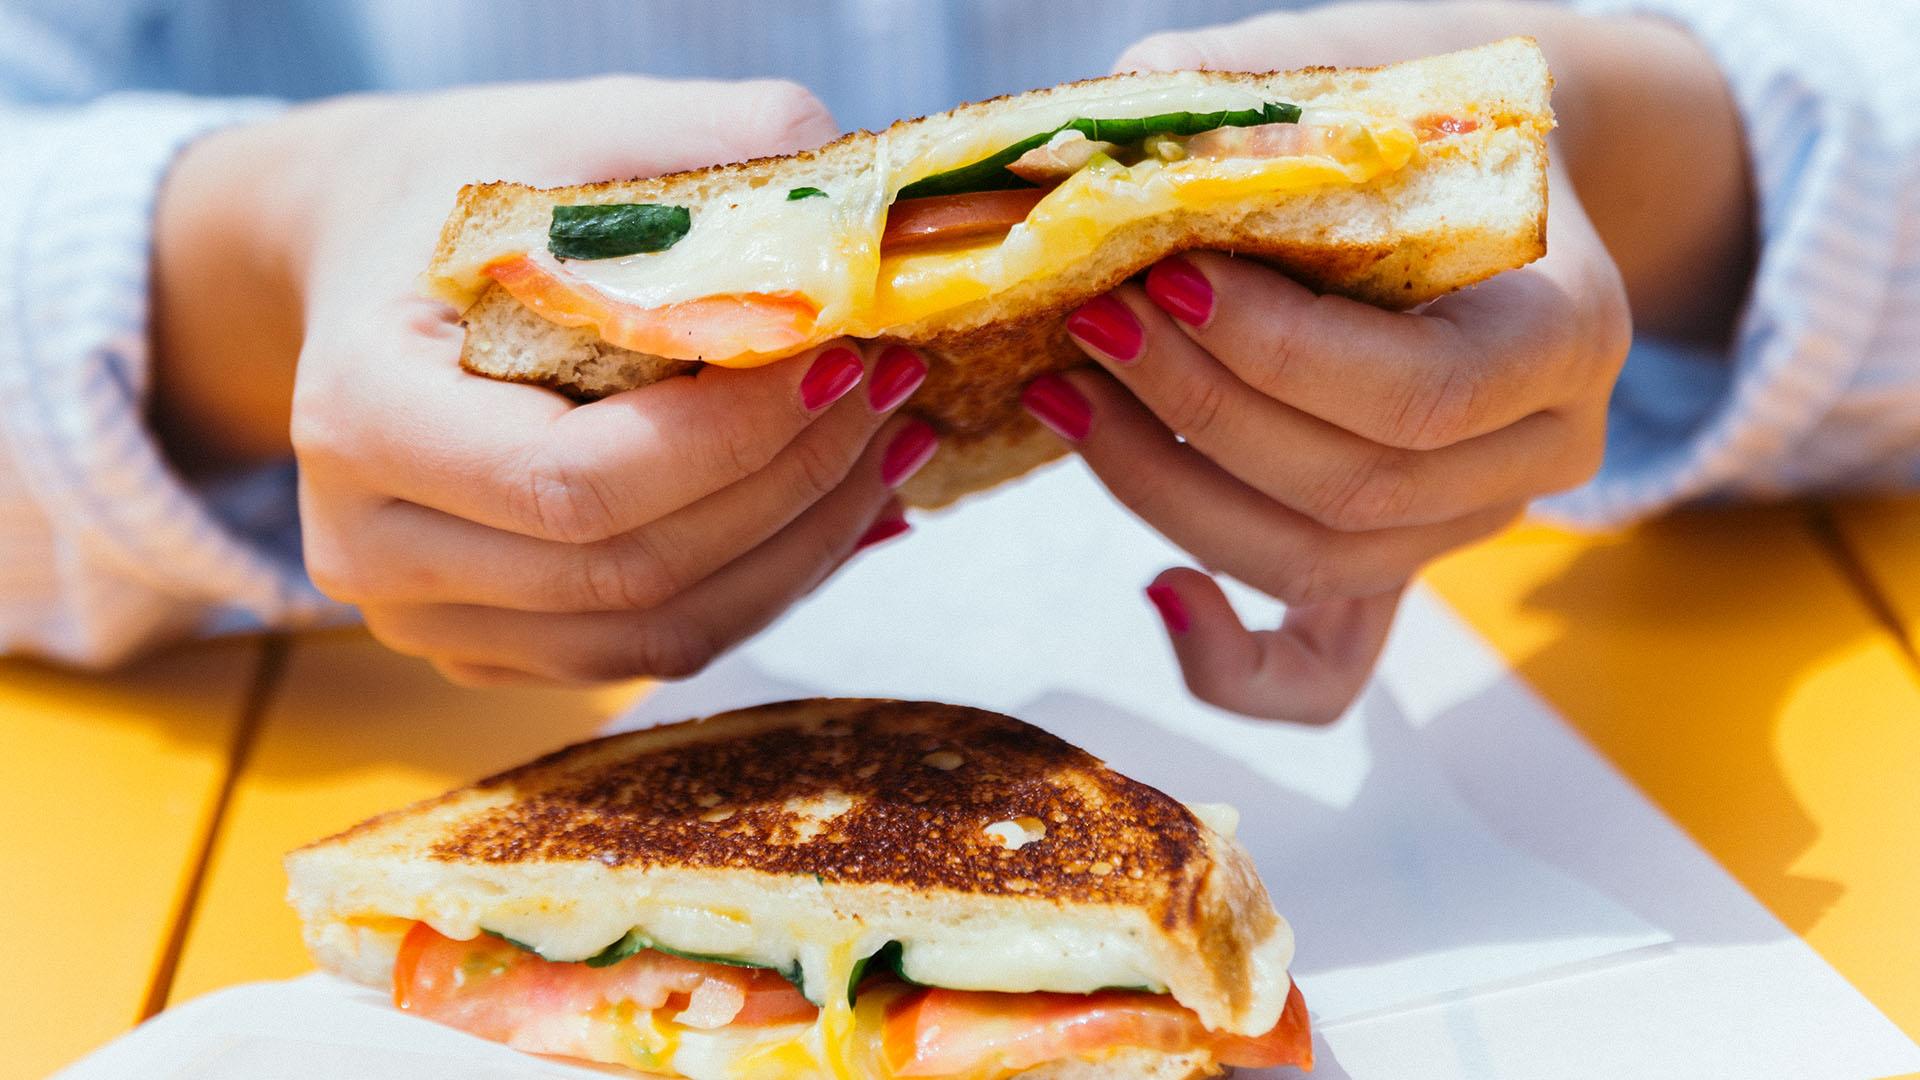 Hand pulling apart a cheesy sandwich